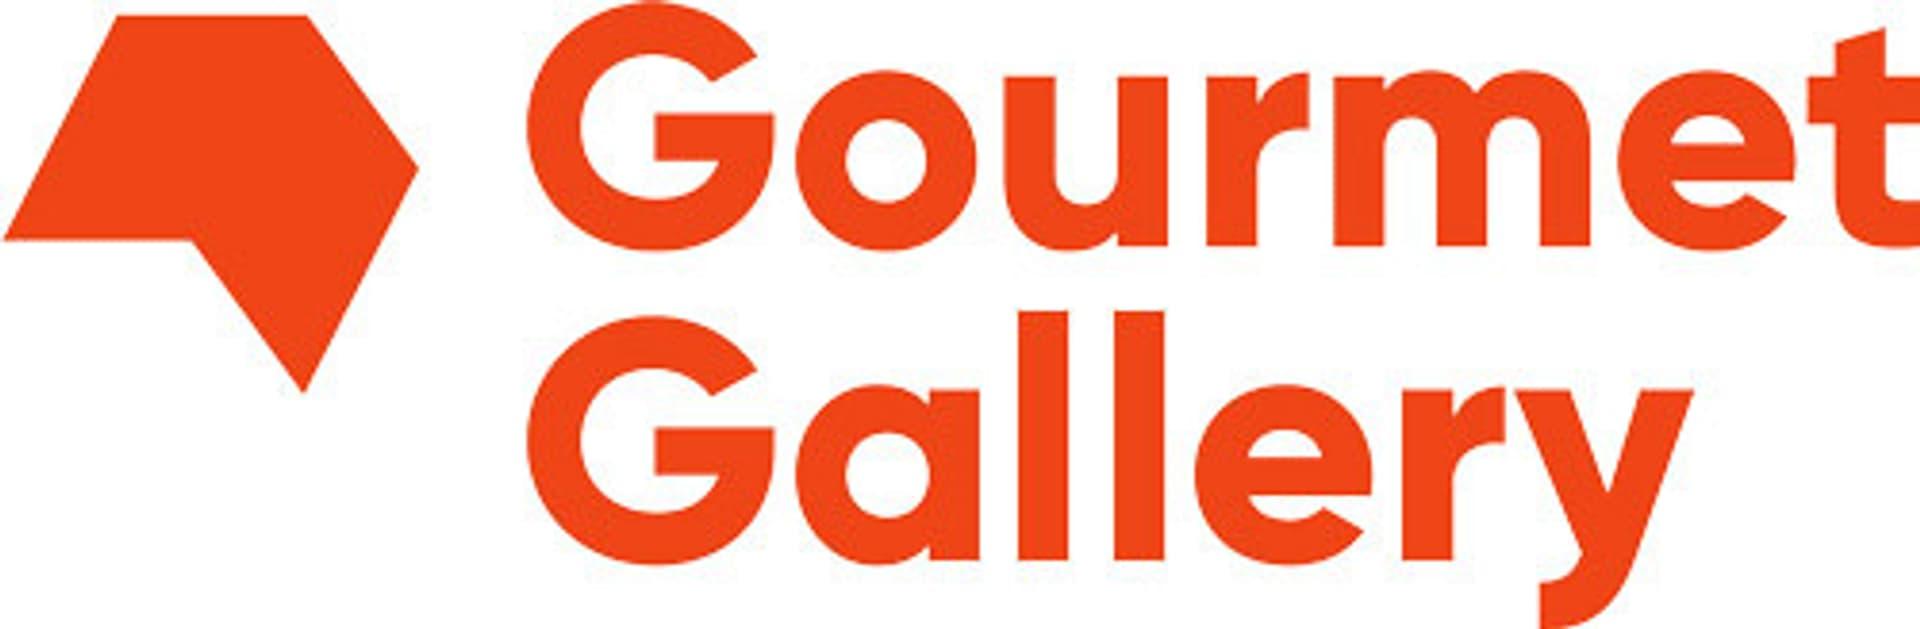 Buchmesse gourmet gallery